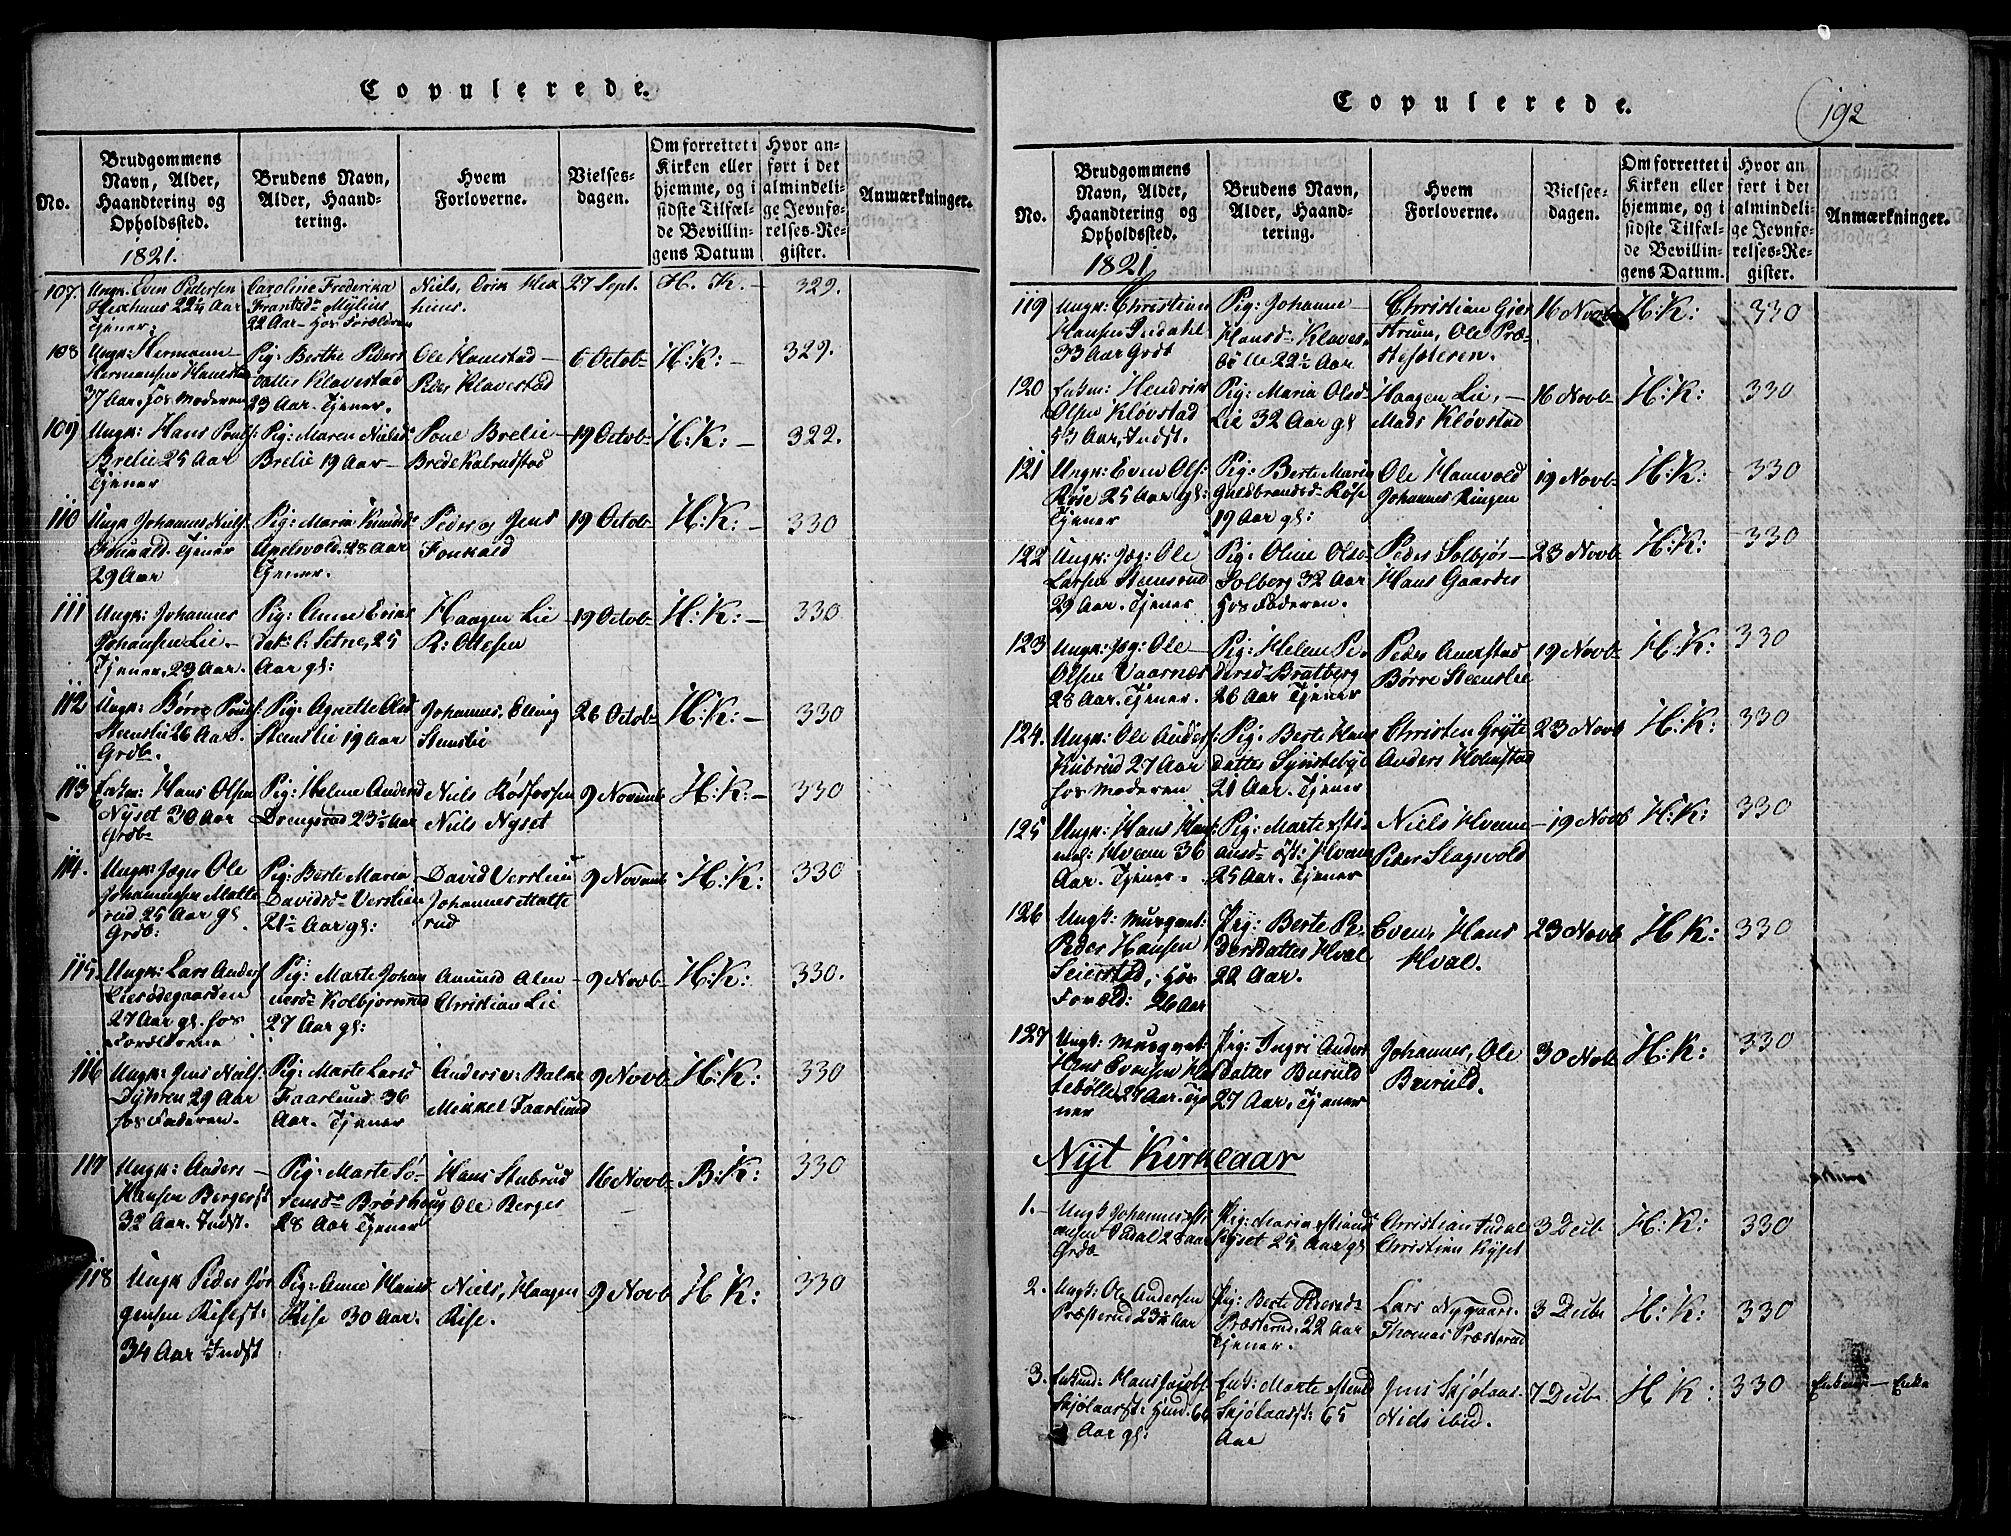 SAH, Toten prestekontor, Ministerialbok nr. 10, 1820-1828, s. 192